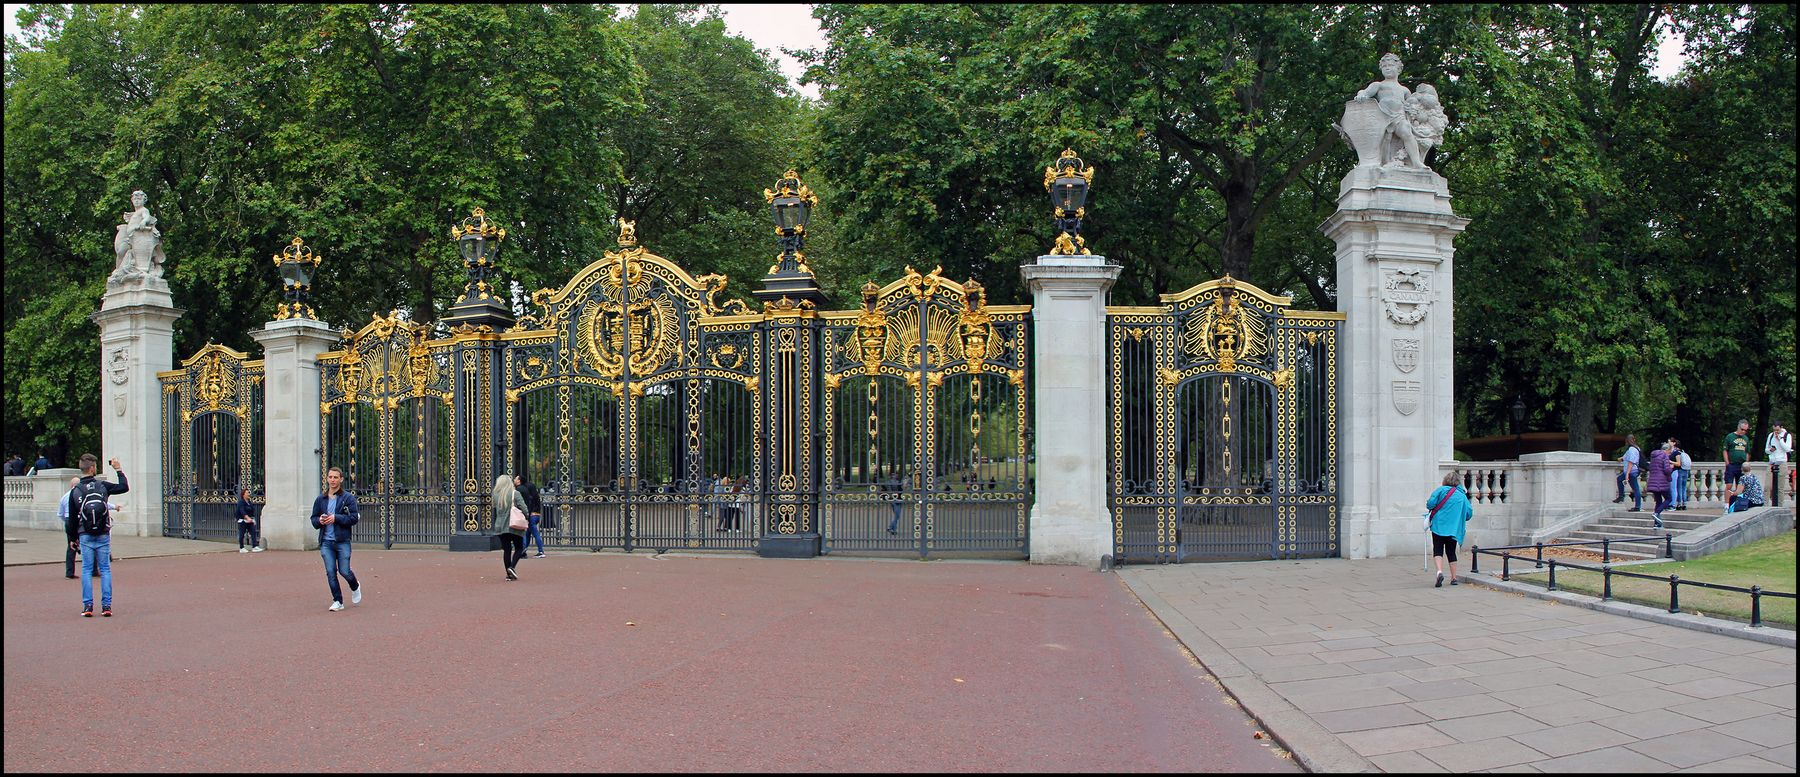 Лондон. Парк рядом с Букингемским дворецом. Лондон Букинге мский дворец Площадь Резиденция королевы Сад Ворота парка